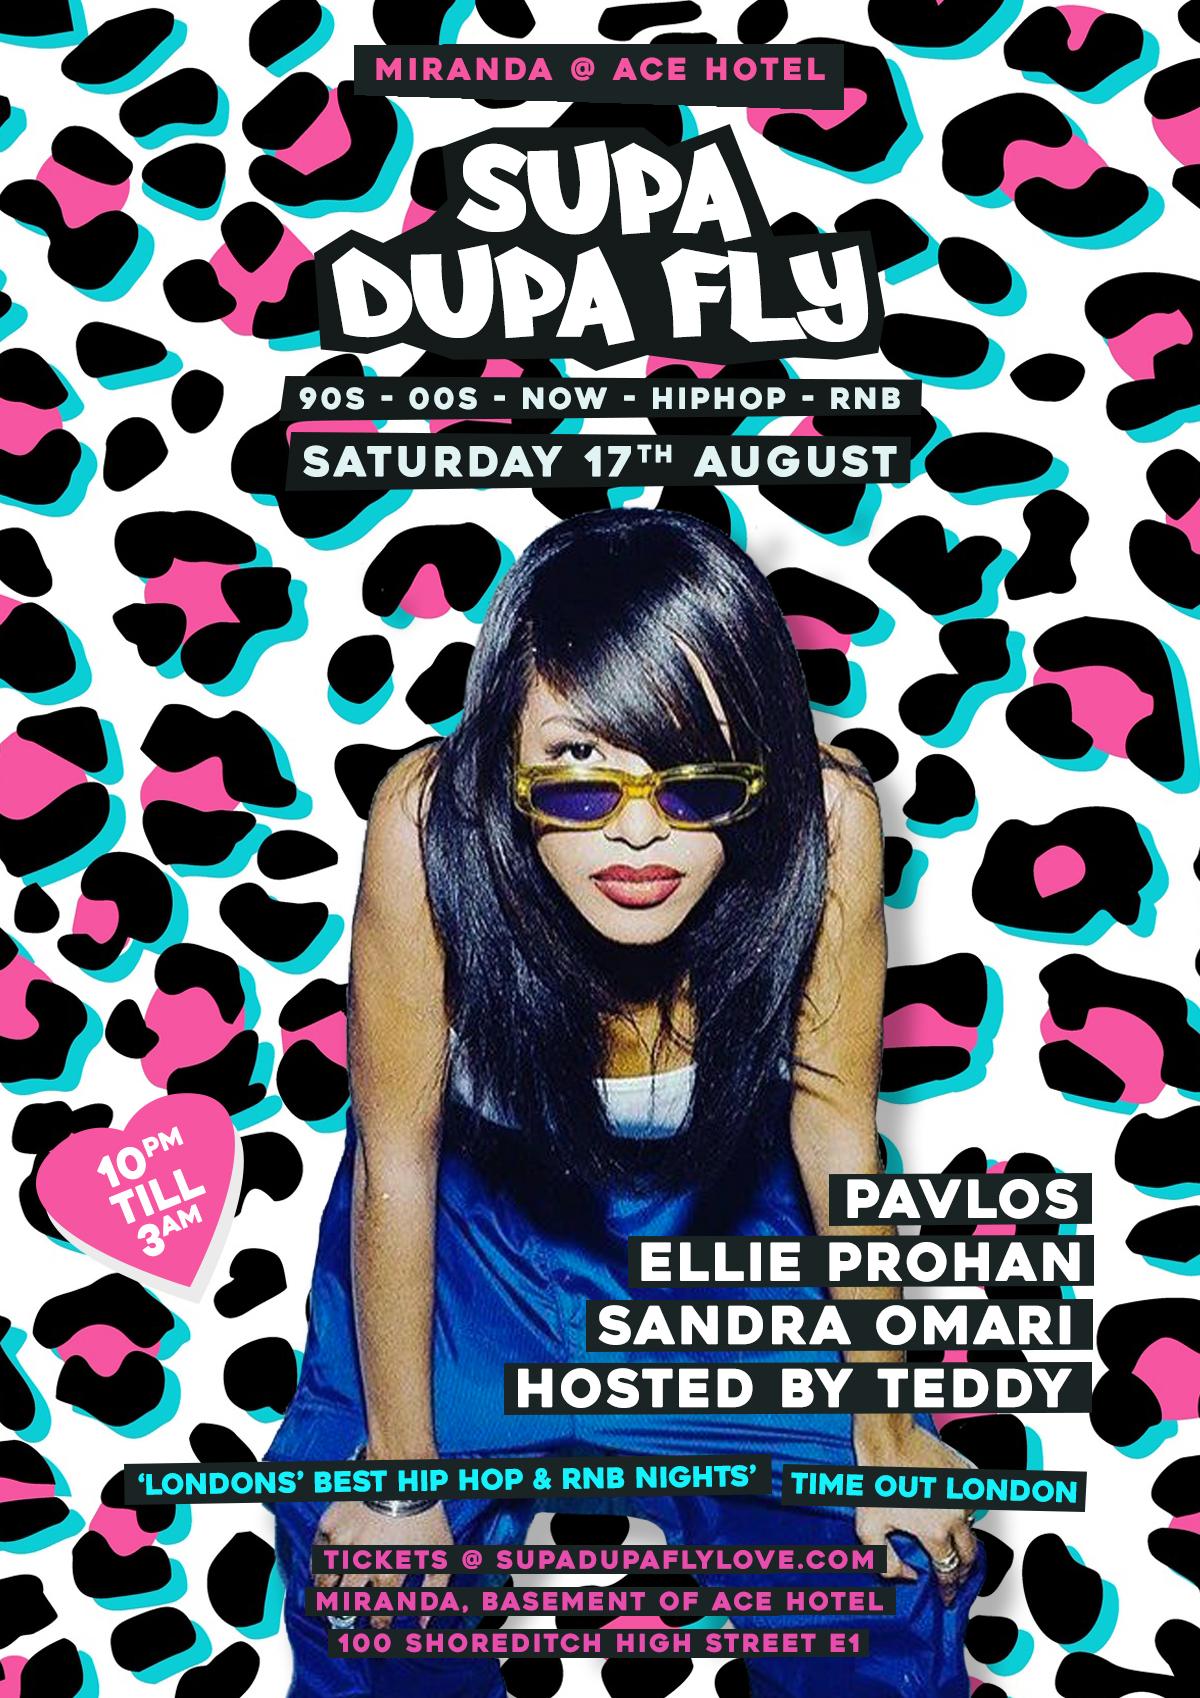 Supa Dupa Fly x Ace Hotel x 3rd Sat's | Shoreditch, London